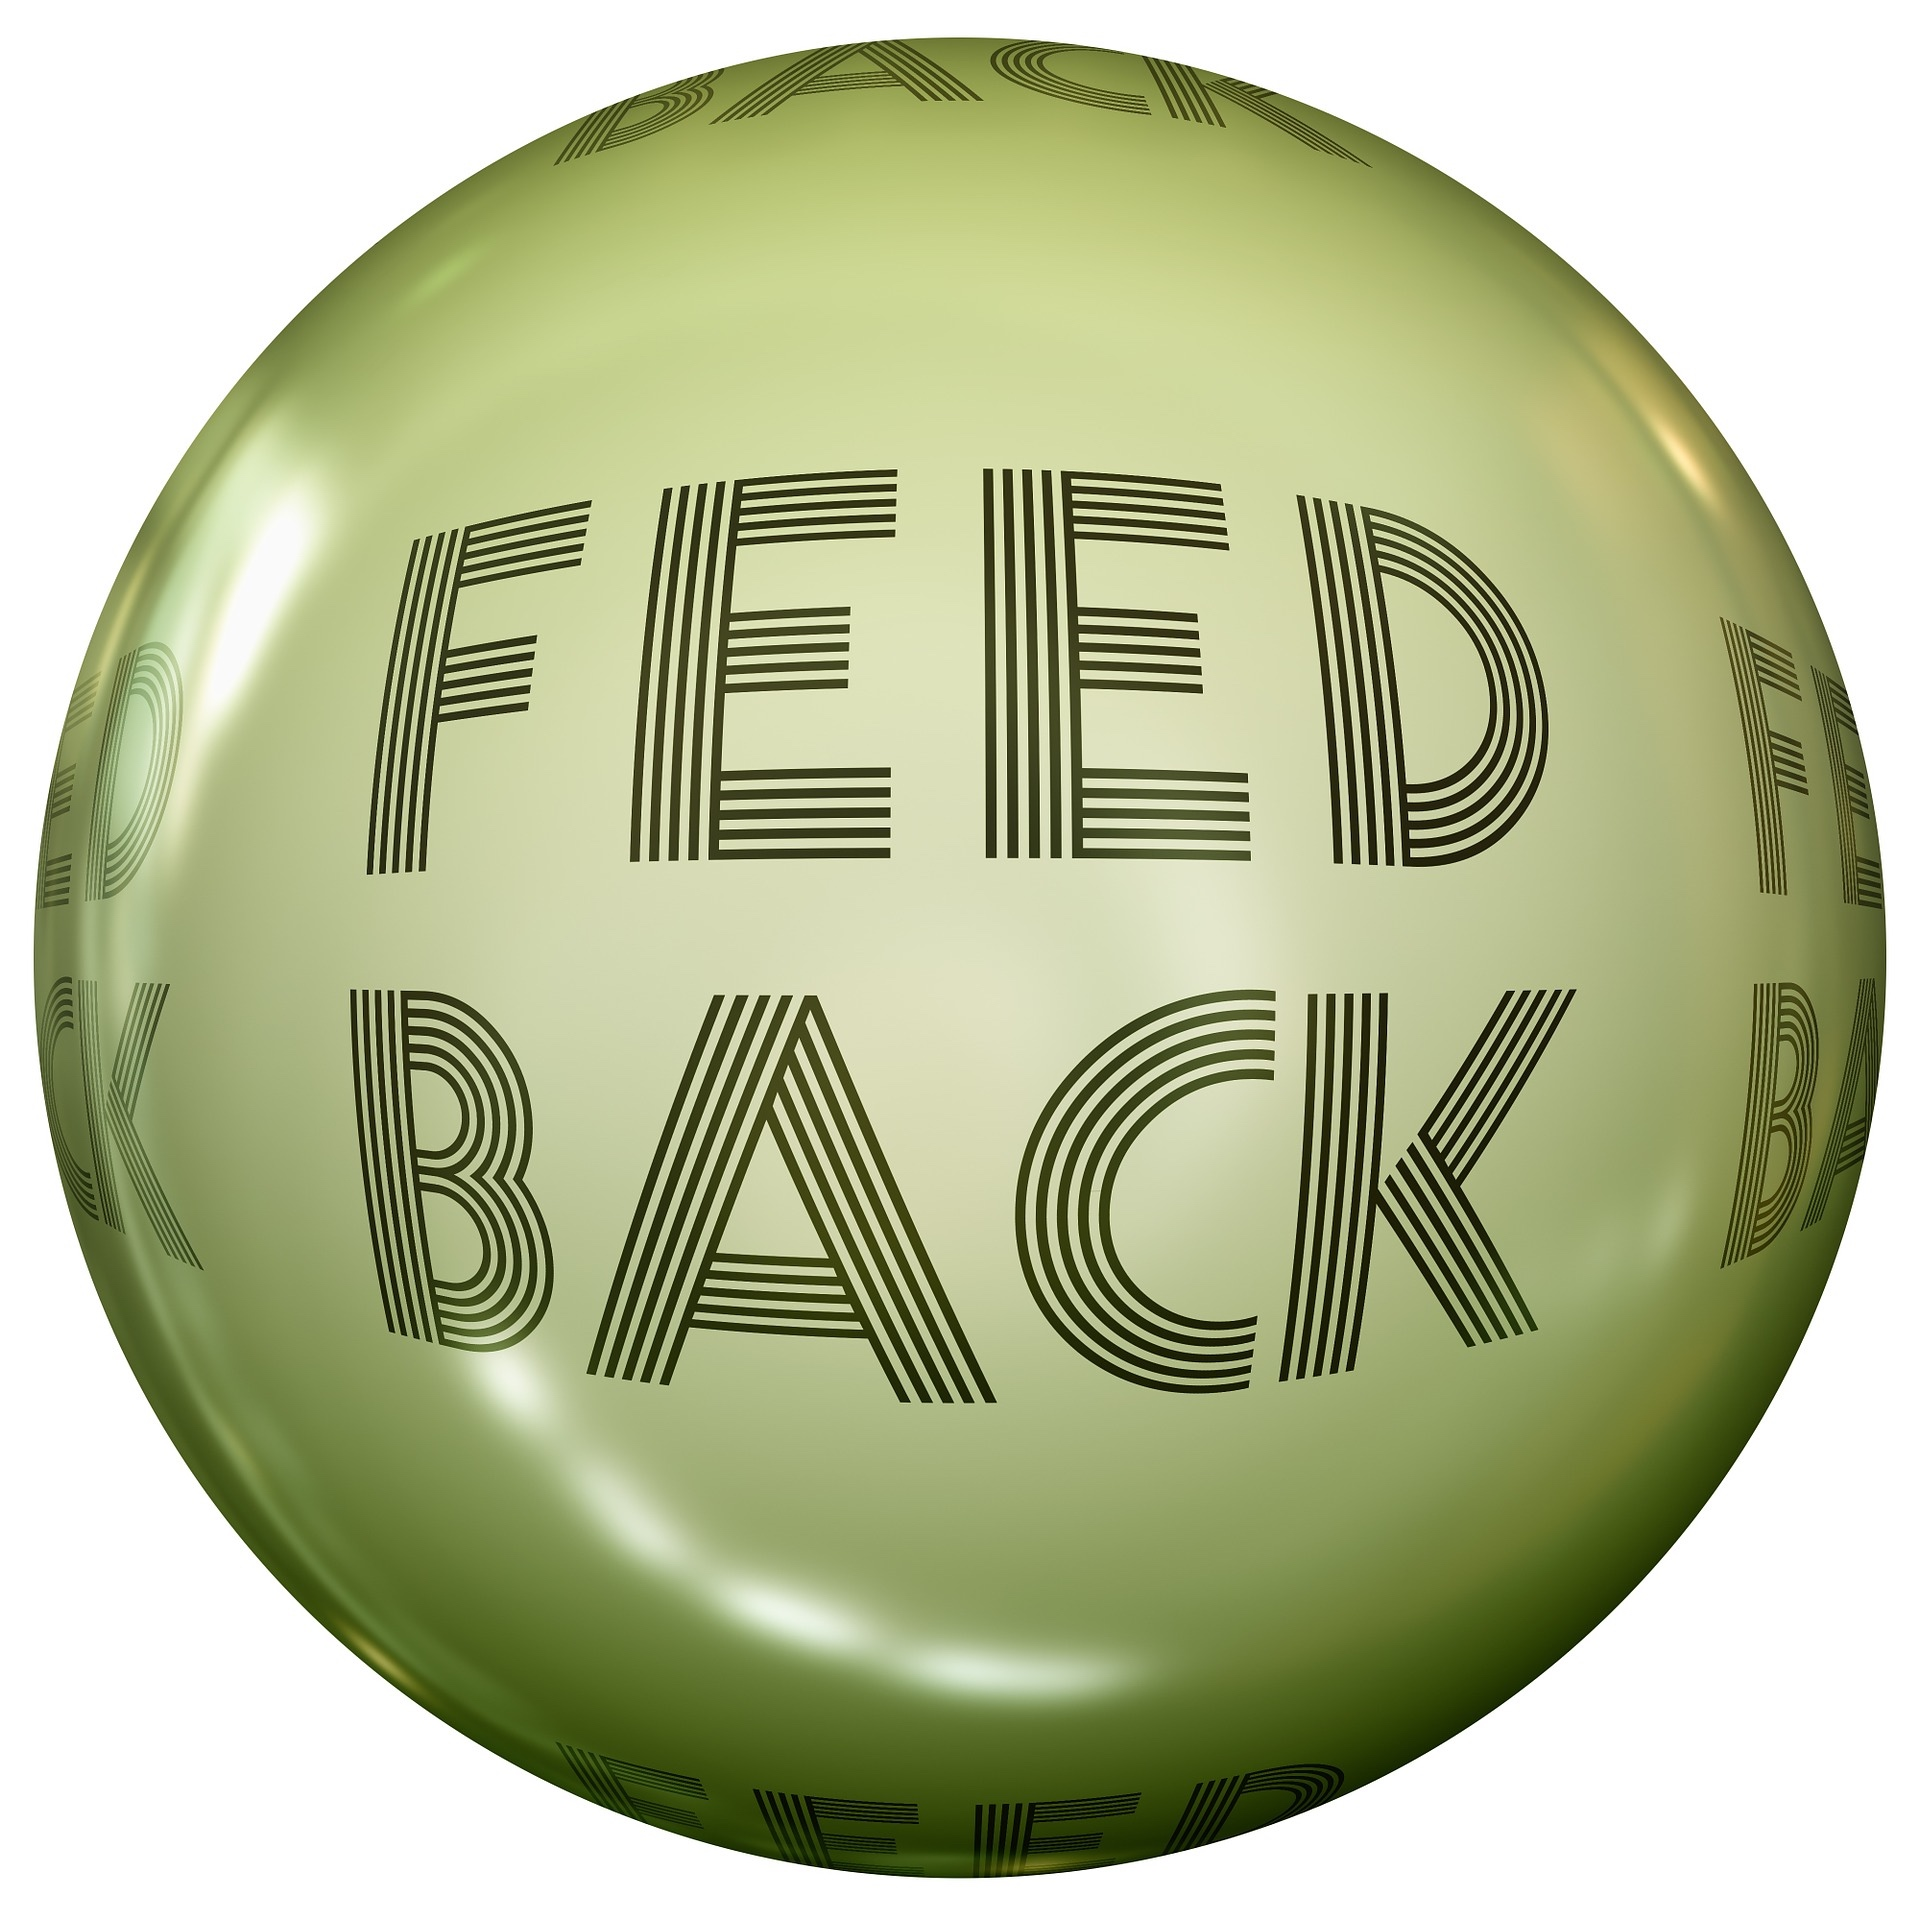 feedback-796140_1920_geralt